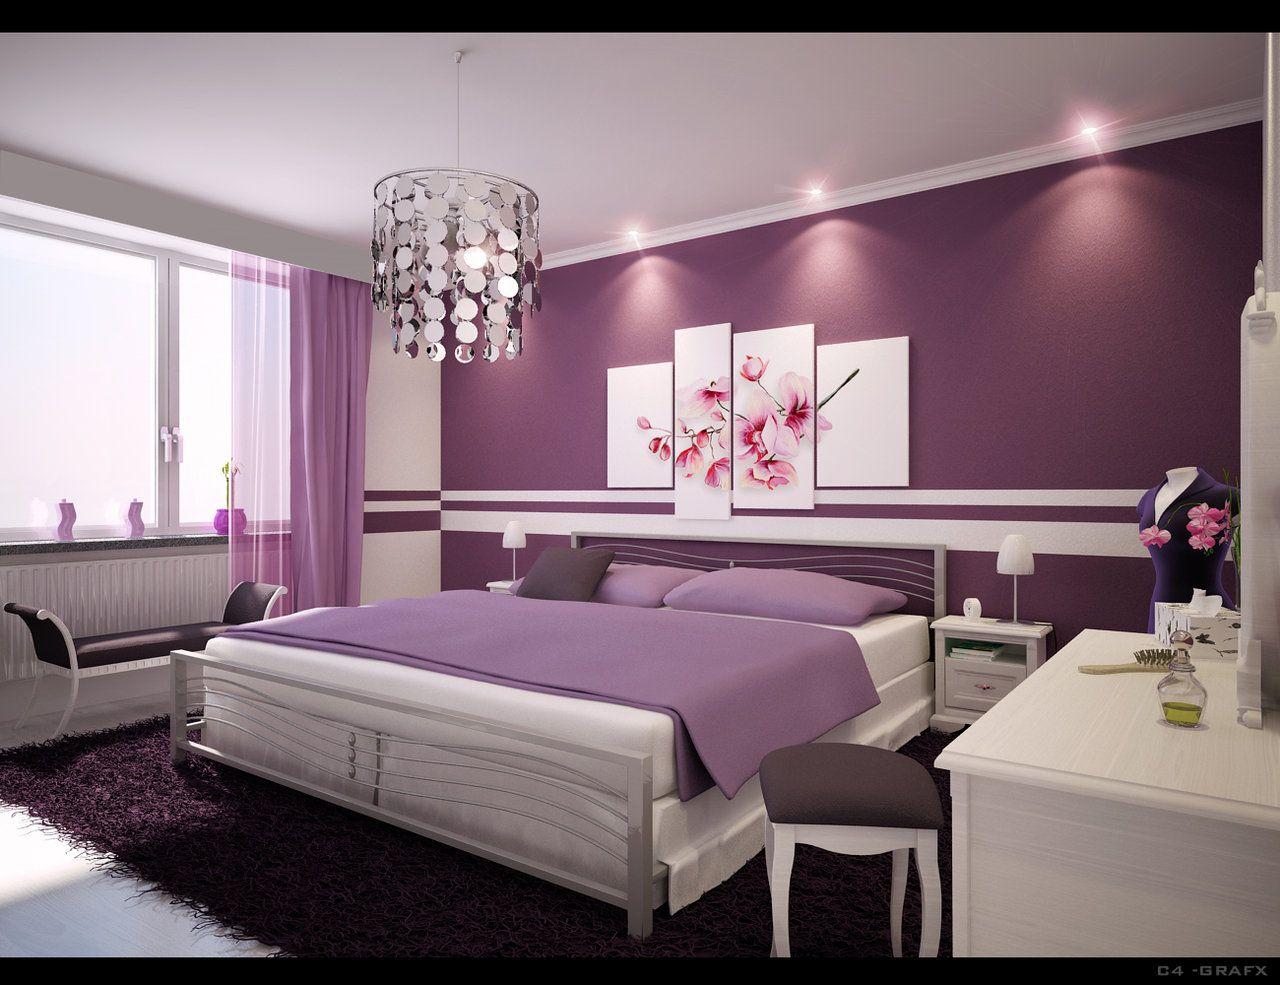 10 beautiful bedroom designs bed room home decor purple10 beautiful bedroom designs bed room